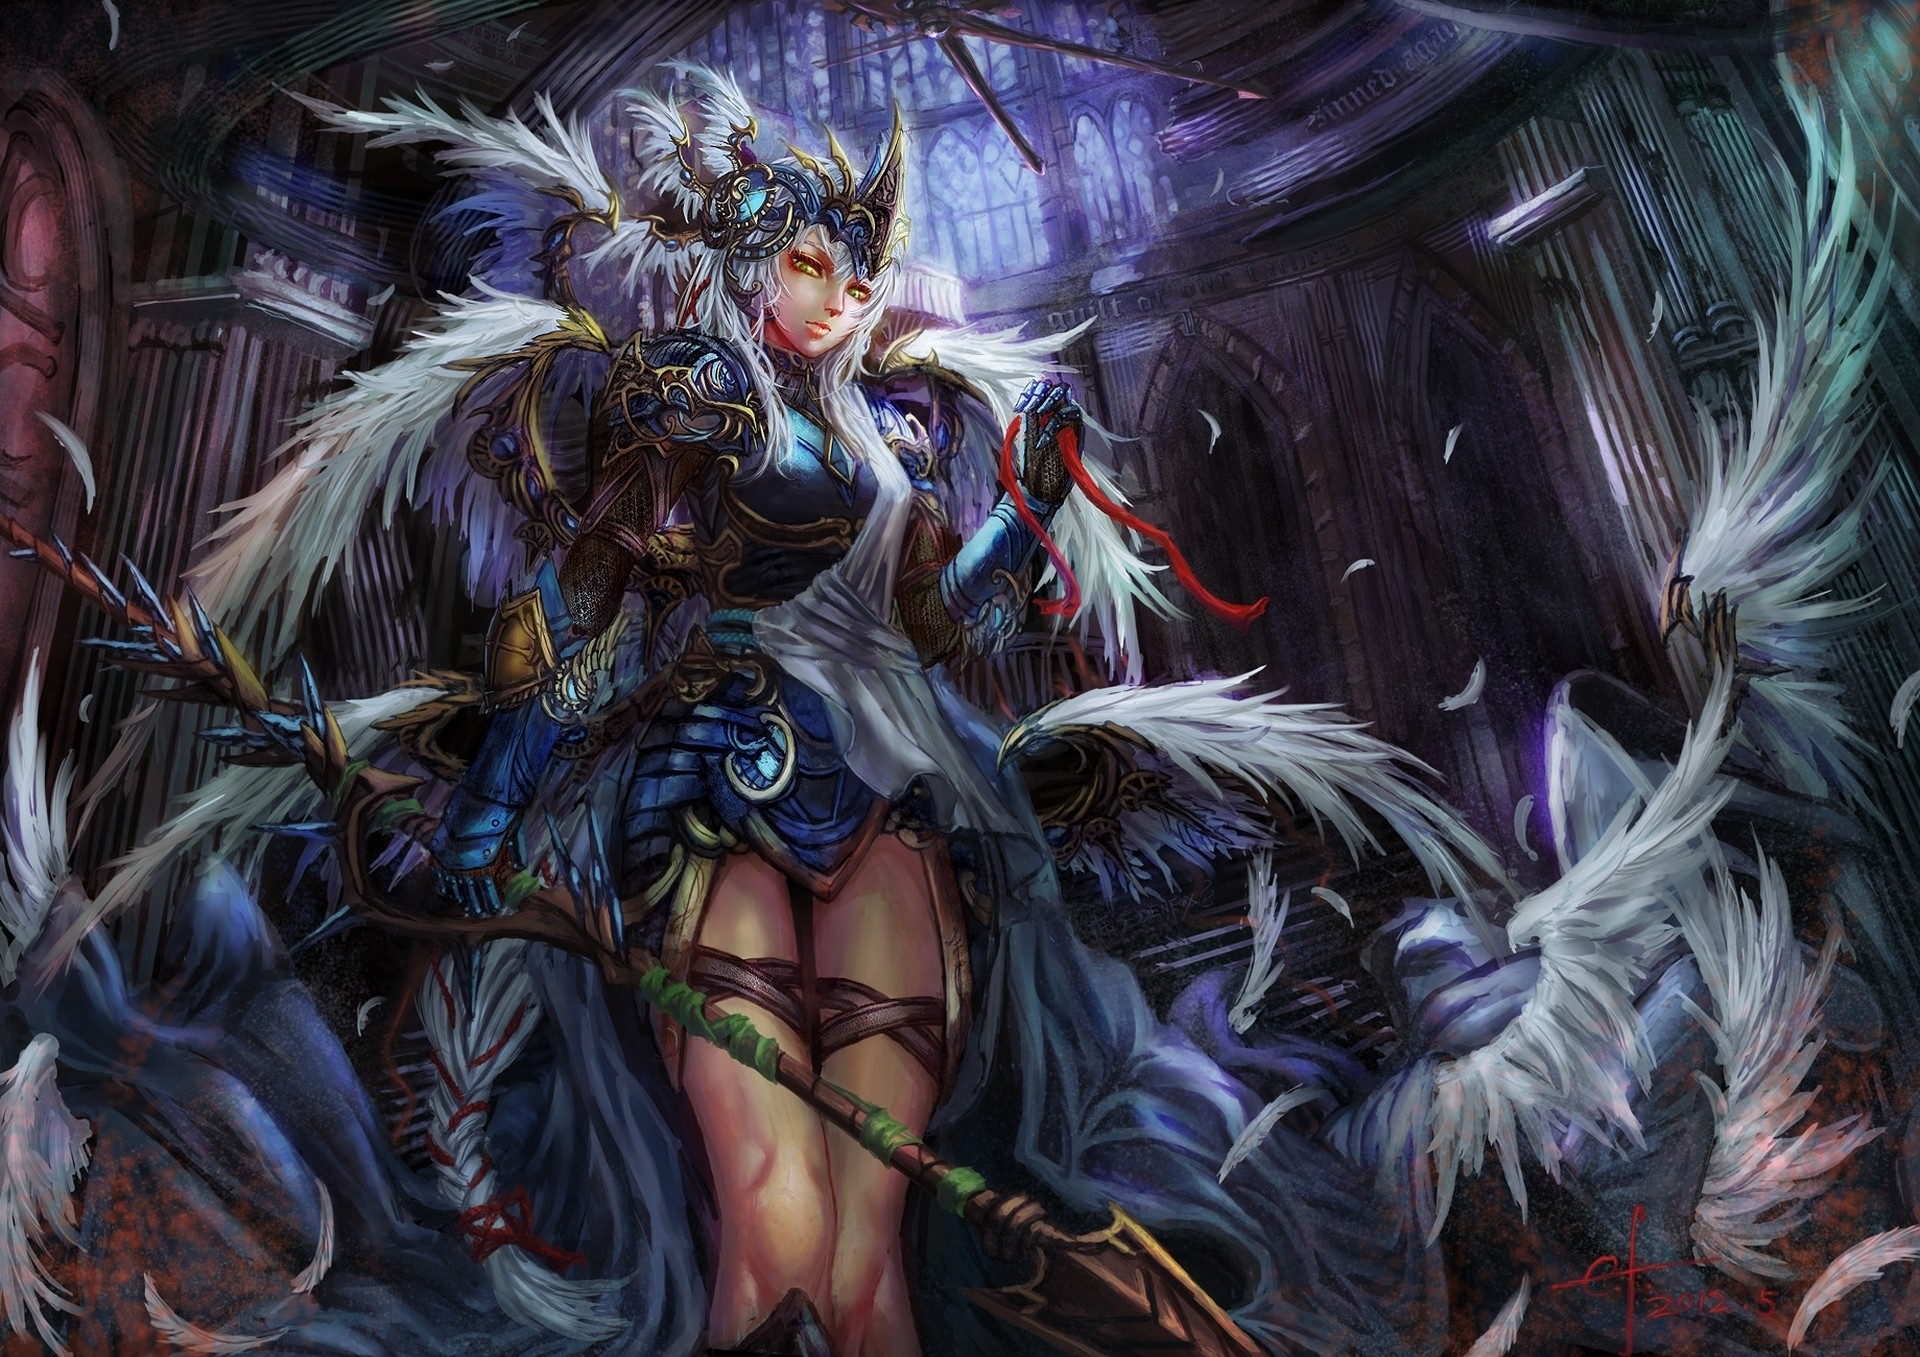 Fantasy Women Warrior Girl Armor Weapon Wallpaper